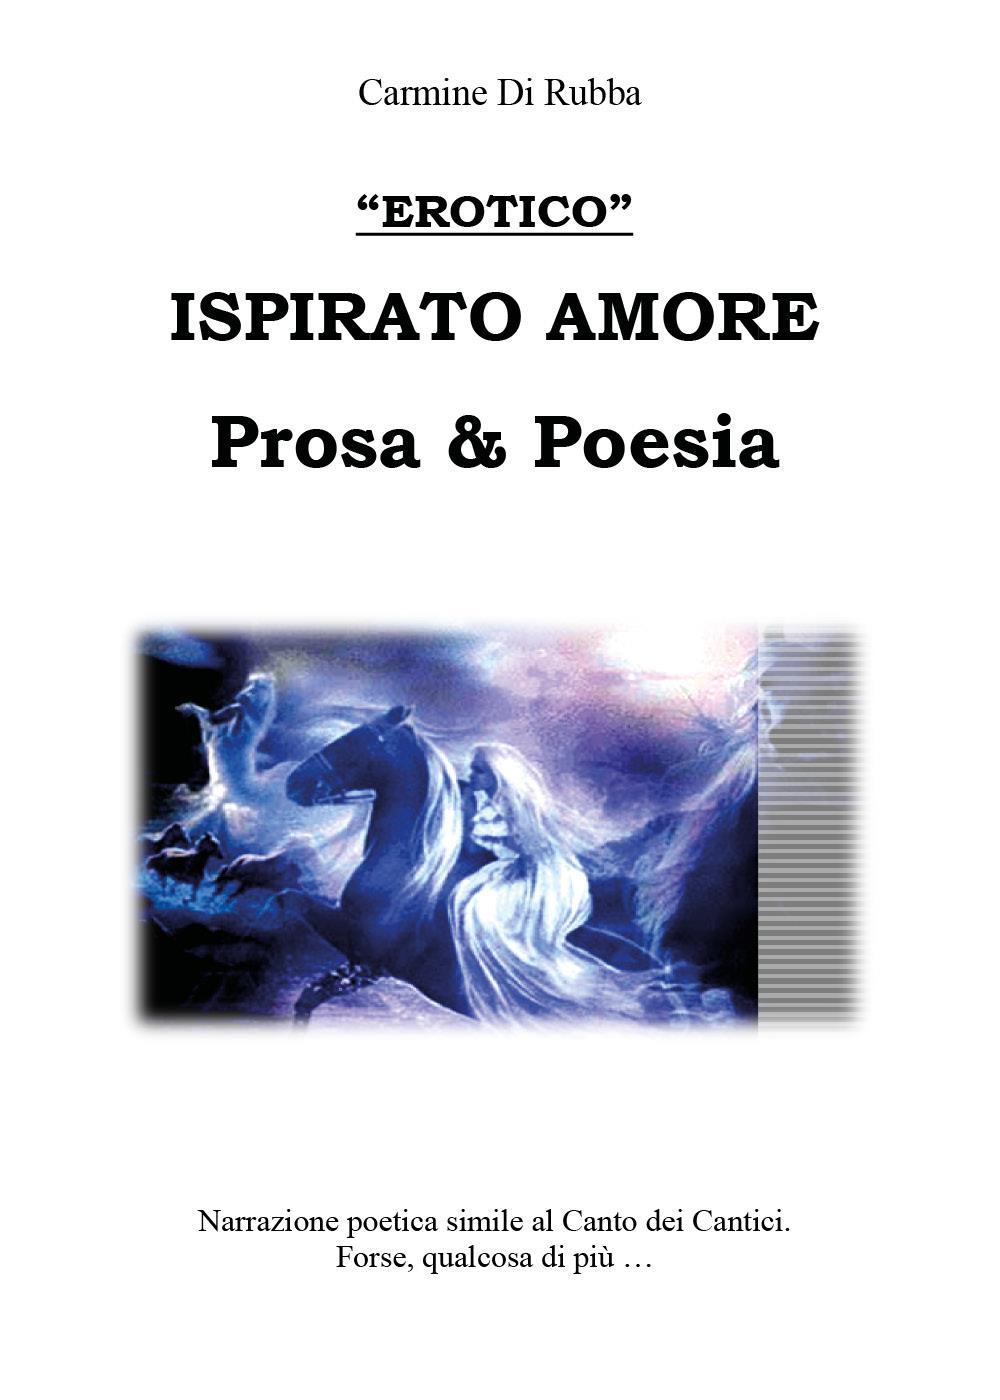 Ispirato d'amore. Prosa & Poesia